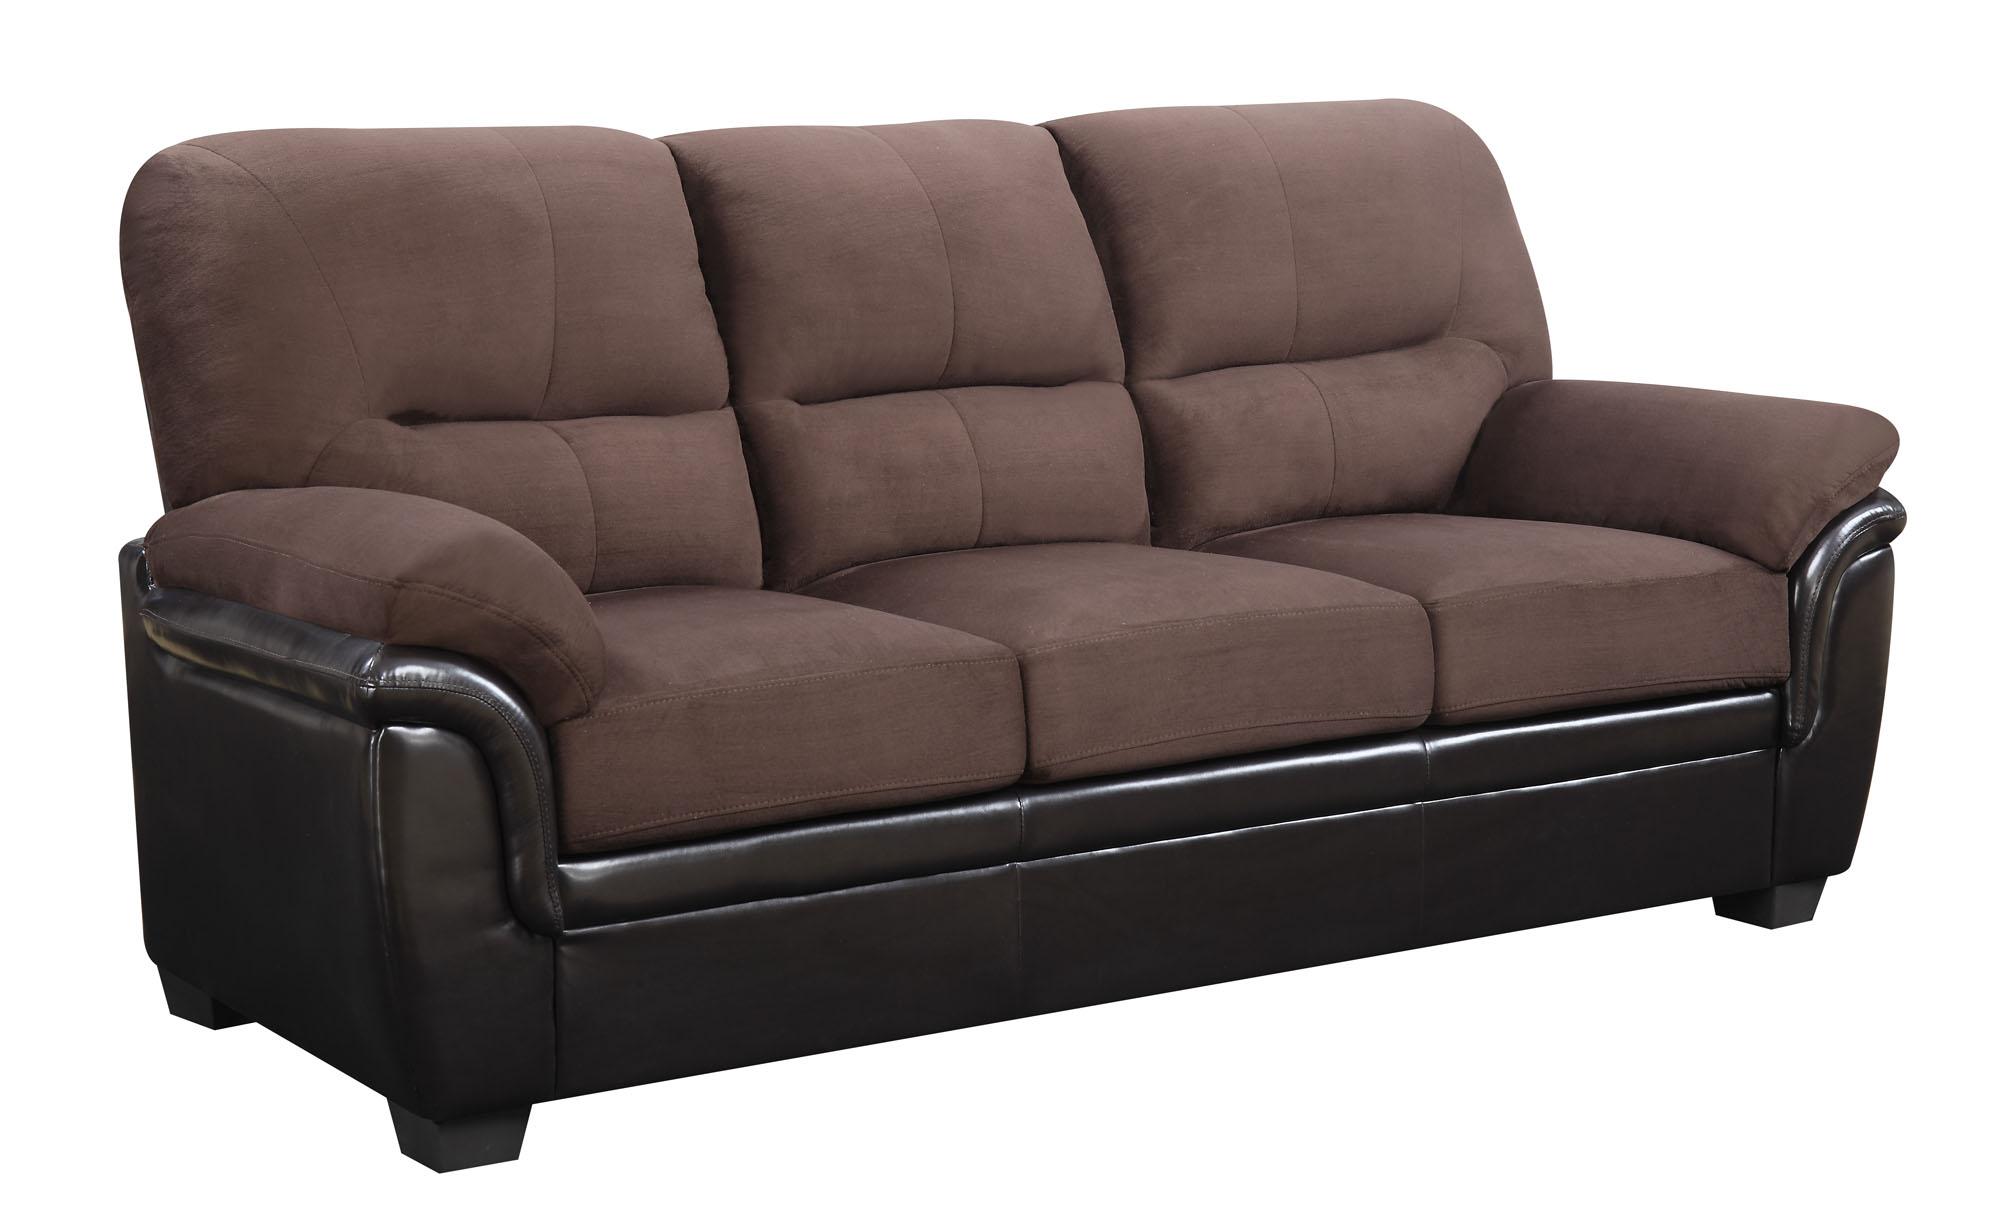 umc3 chocolate brown pu sofa by global furniture. Black Bedroom Furniture Sets. Home Design Ideas